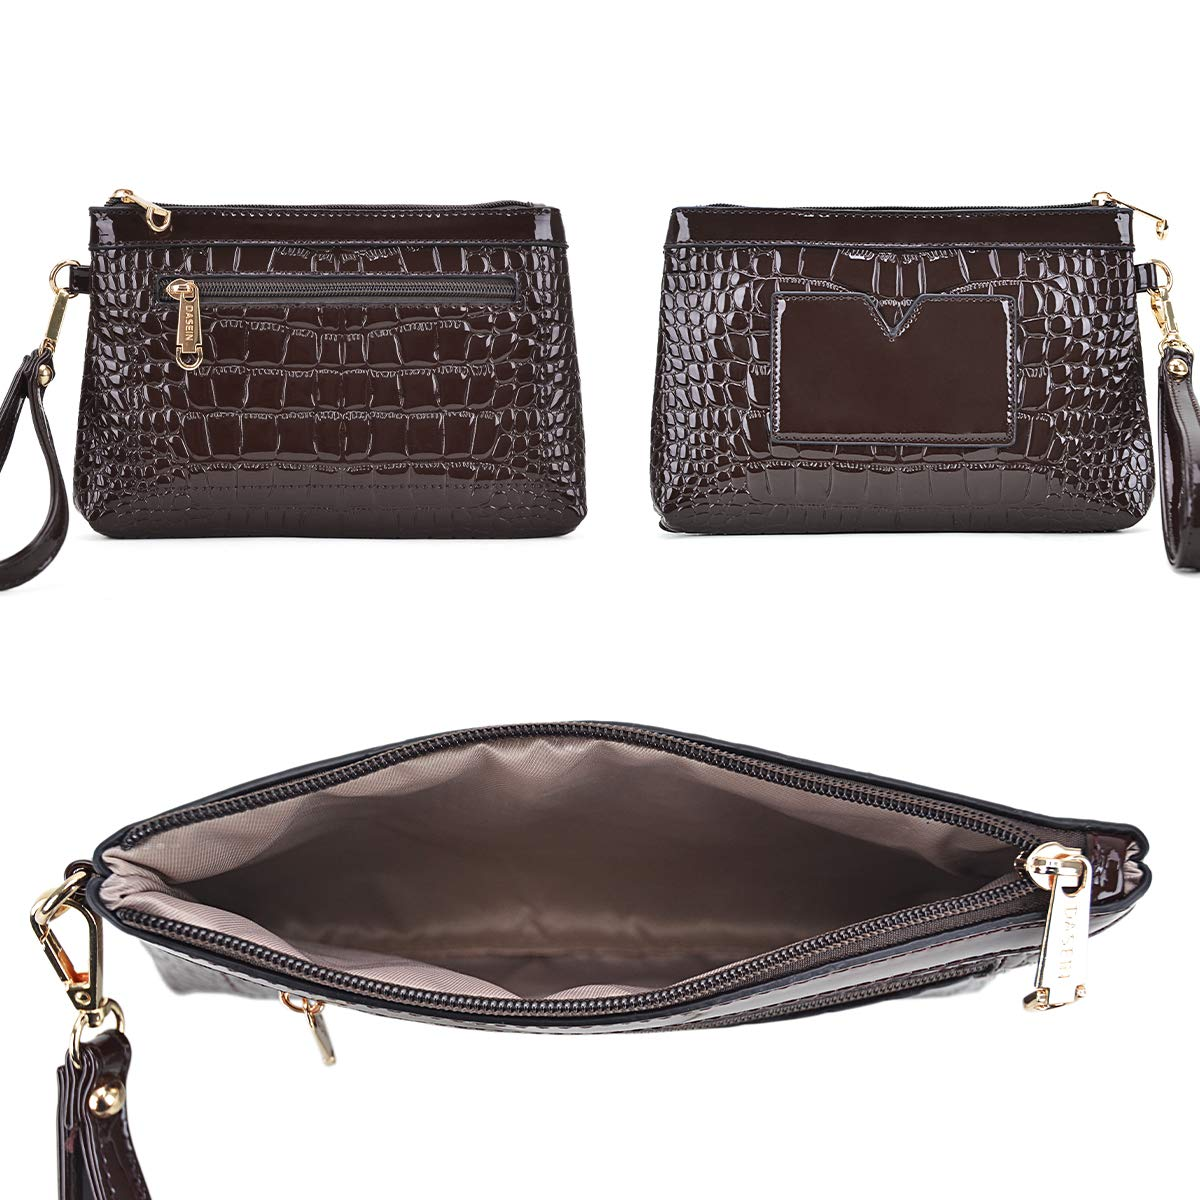 Dasein Women Barrel Handbags Purses Fashion Satchel Bags Top Handle Shoulder Bags Vegan Leather Tote Bags by Dasein (Image #7)